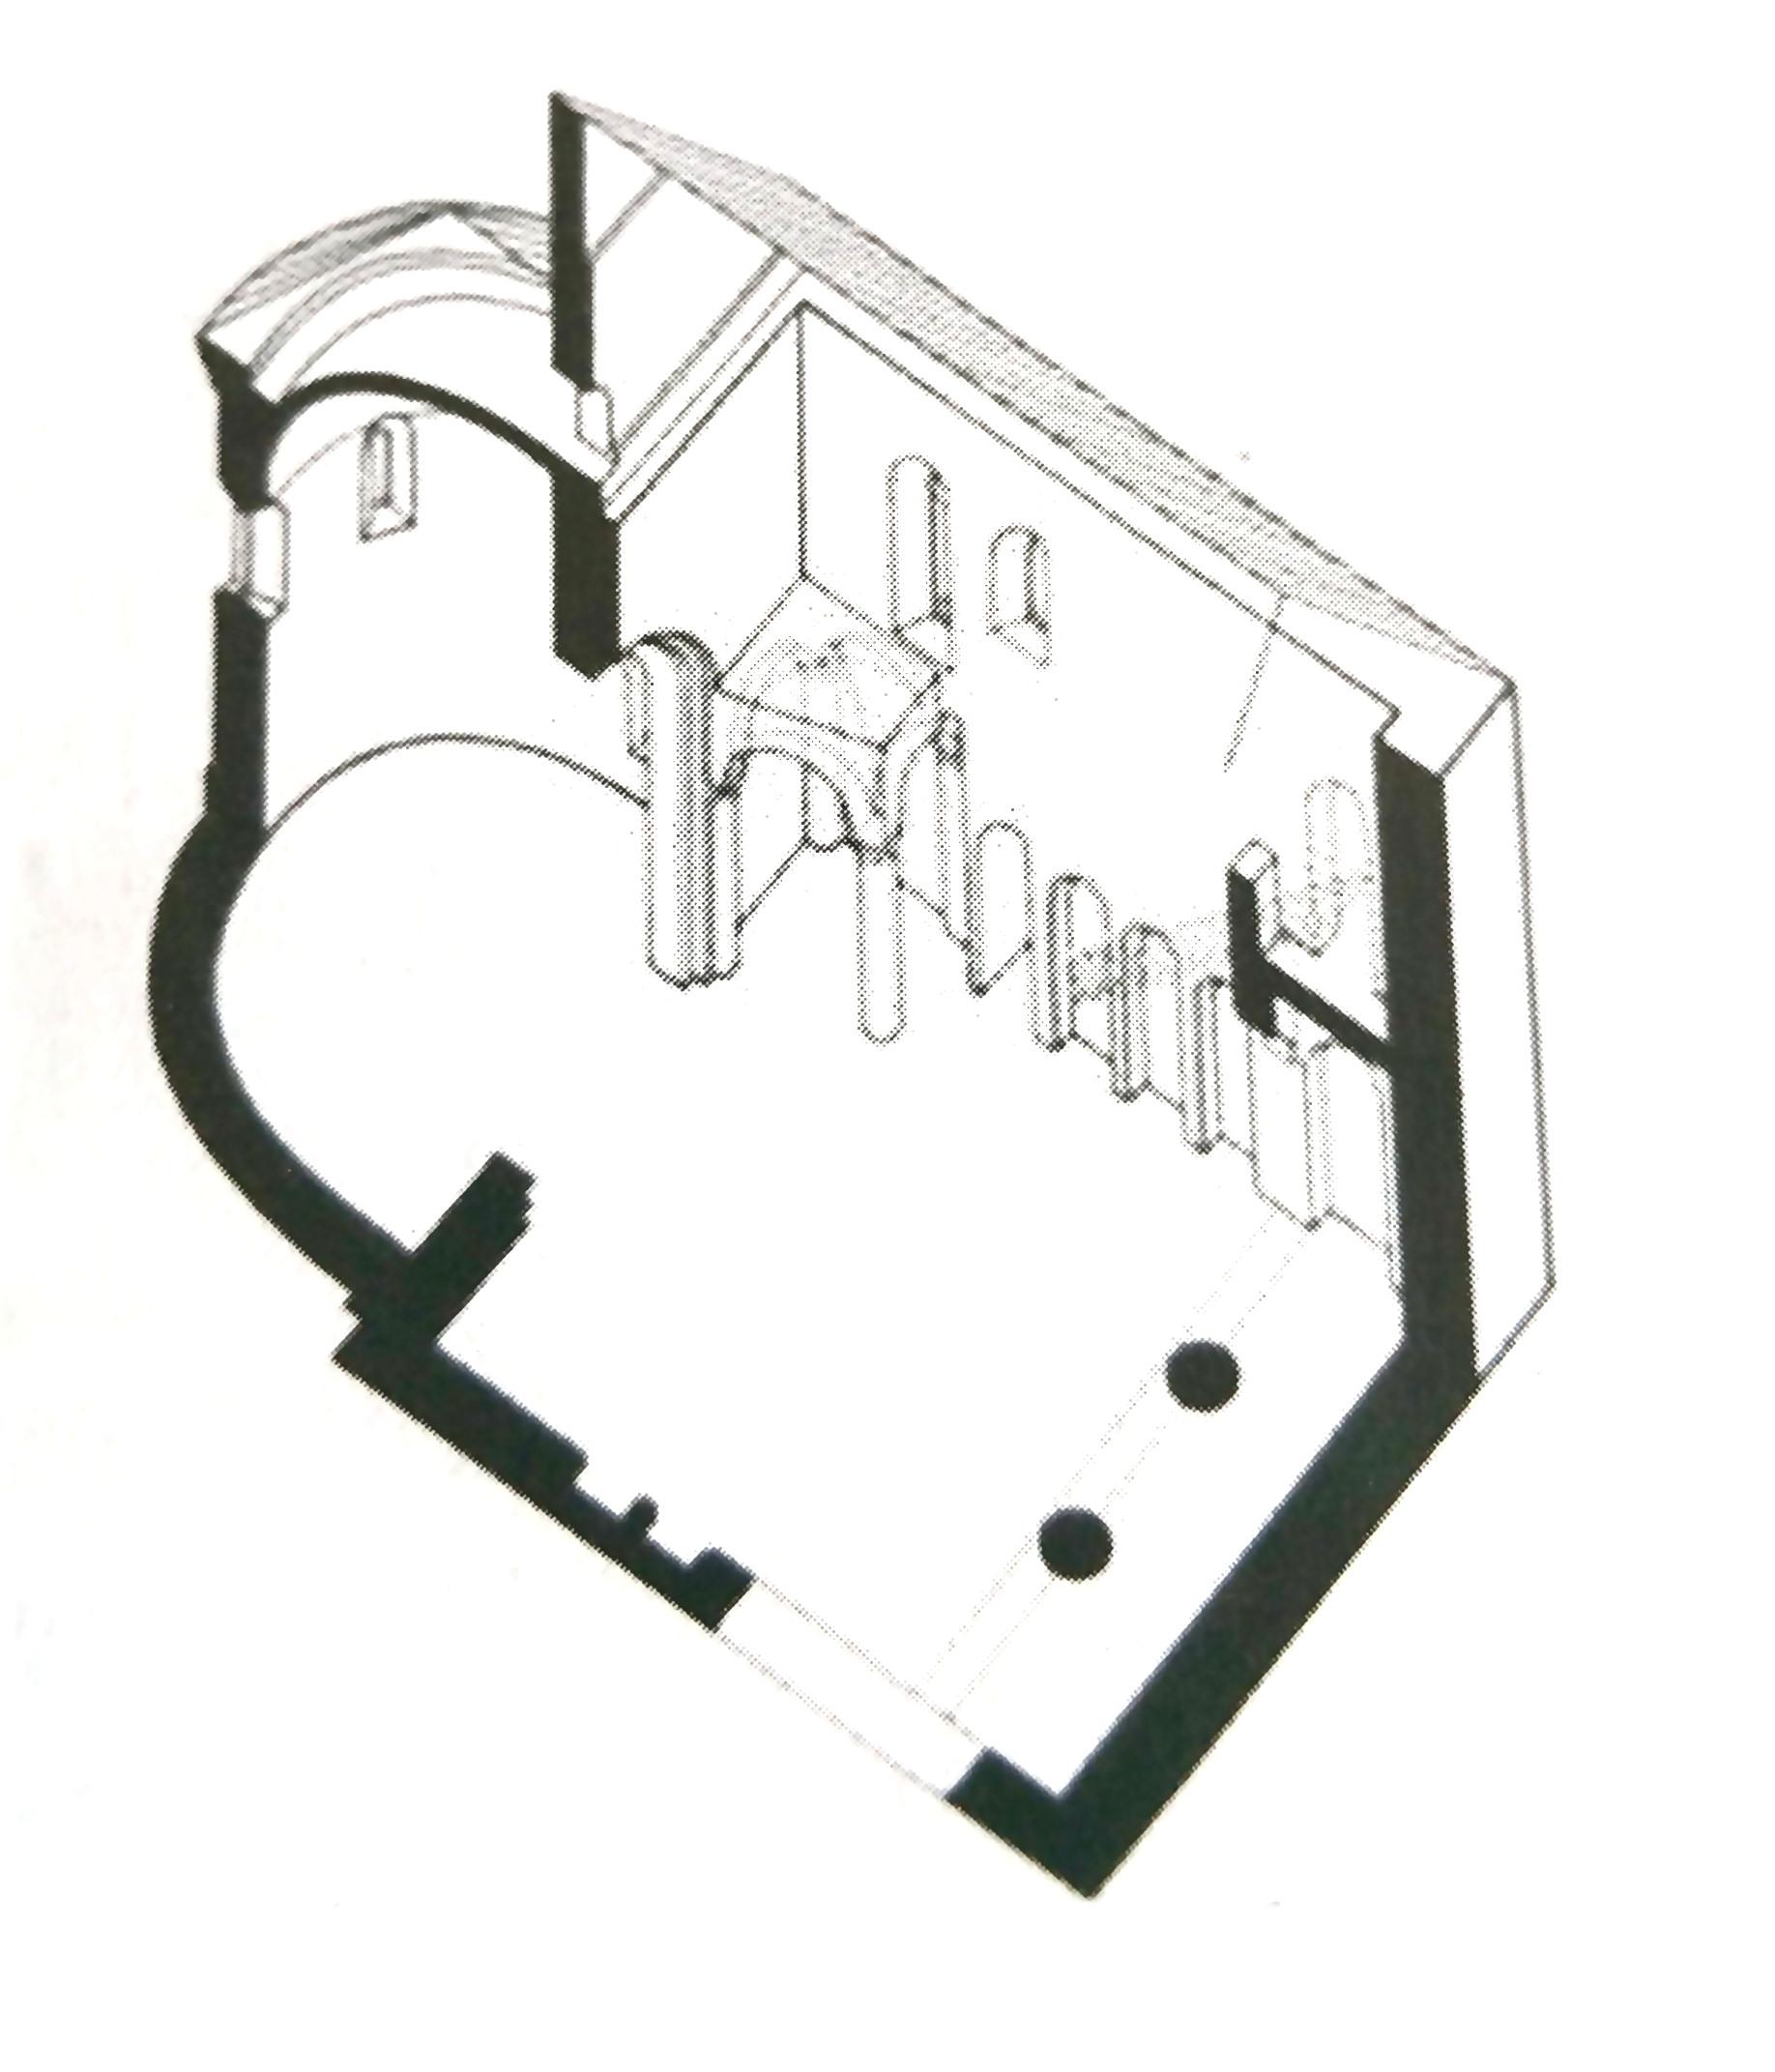 A templom axonometrikus rajza